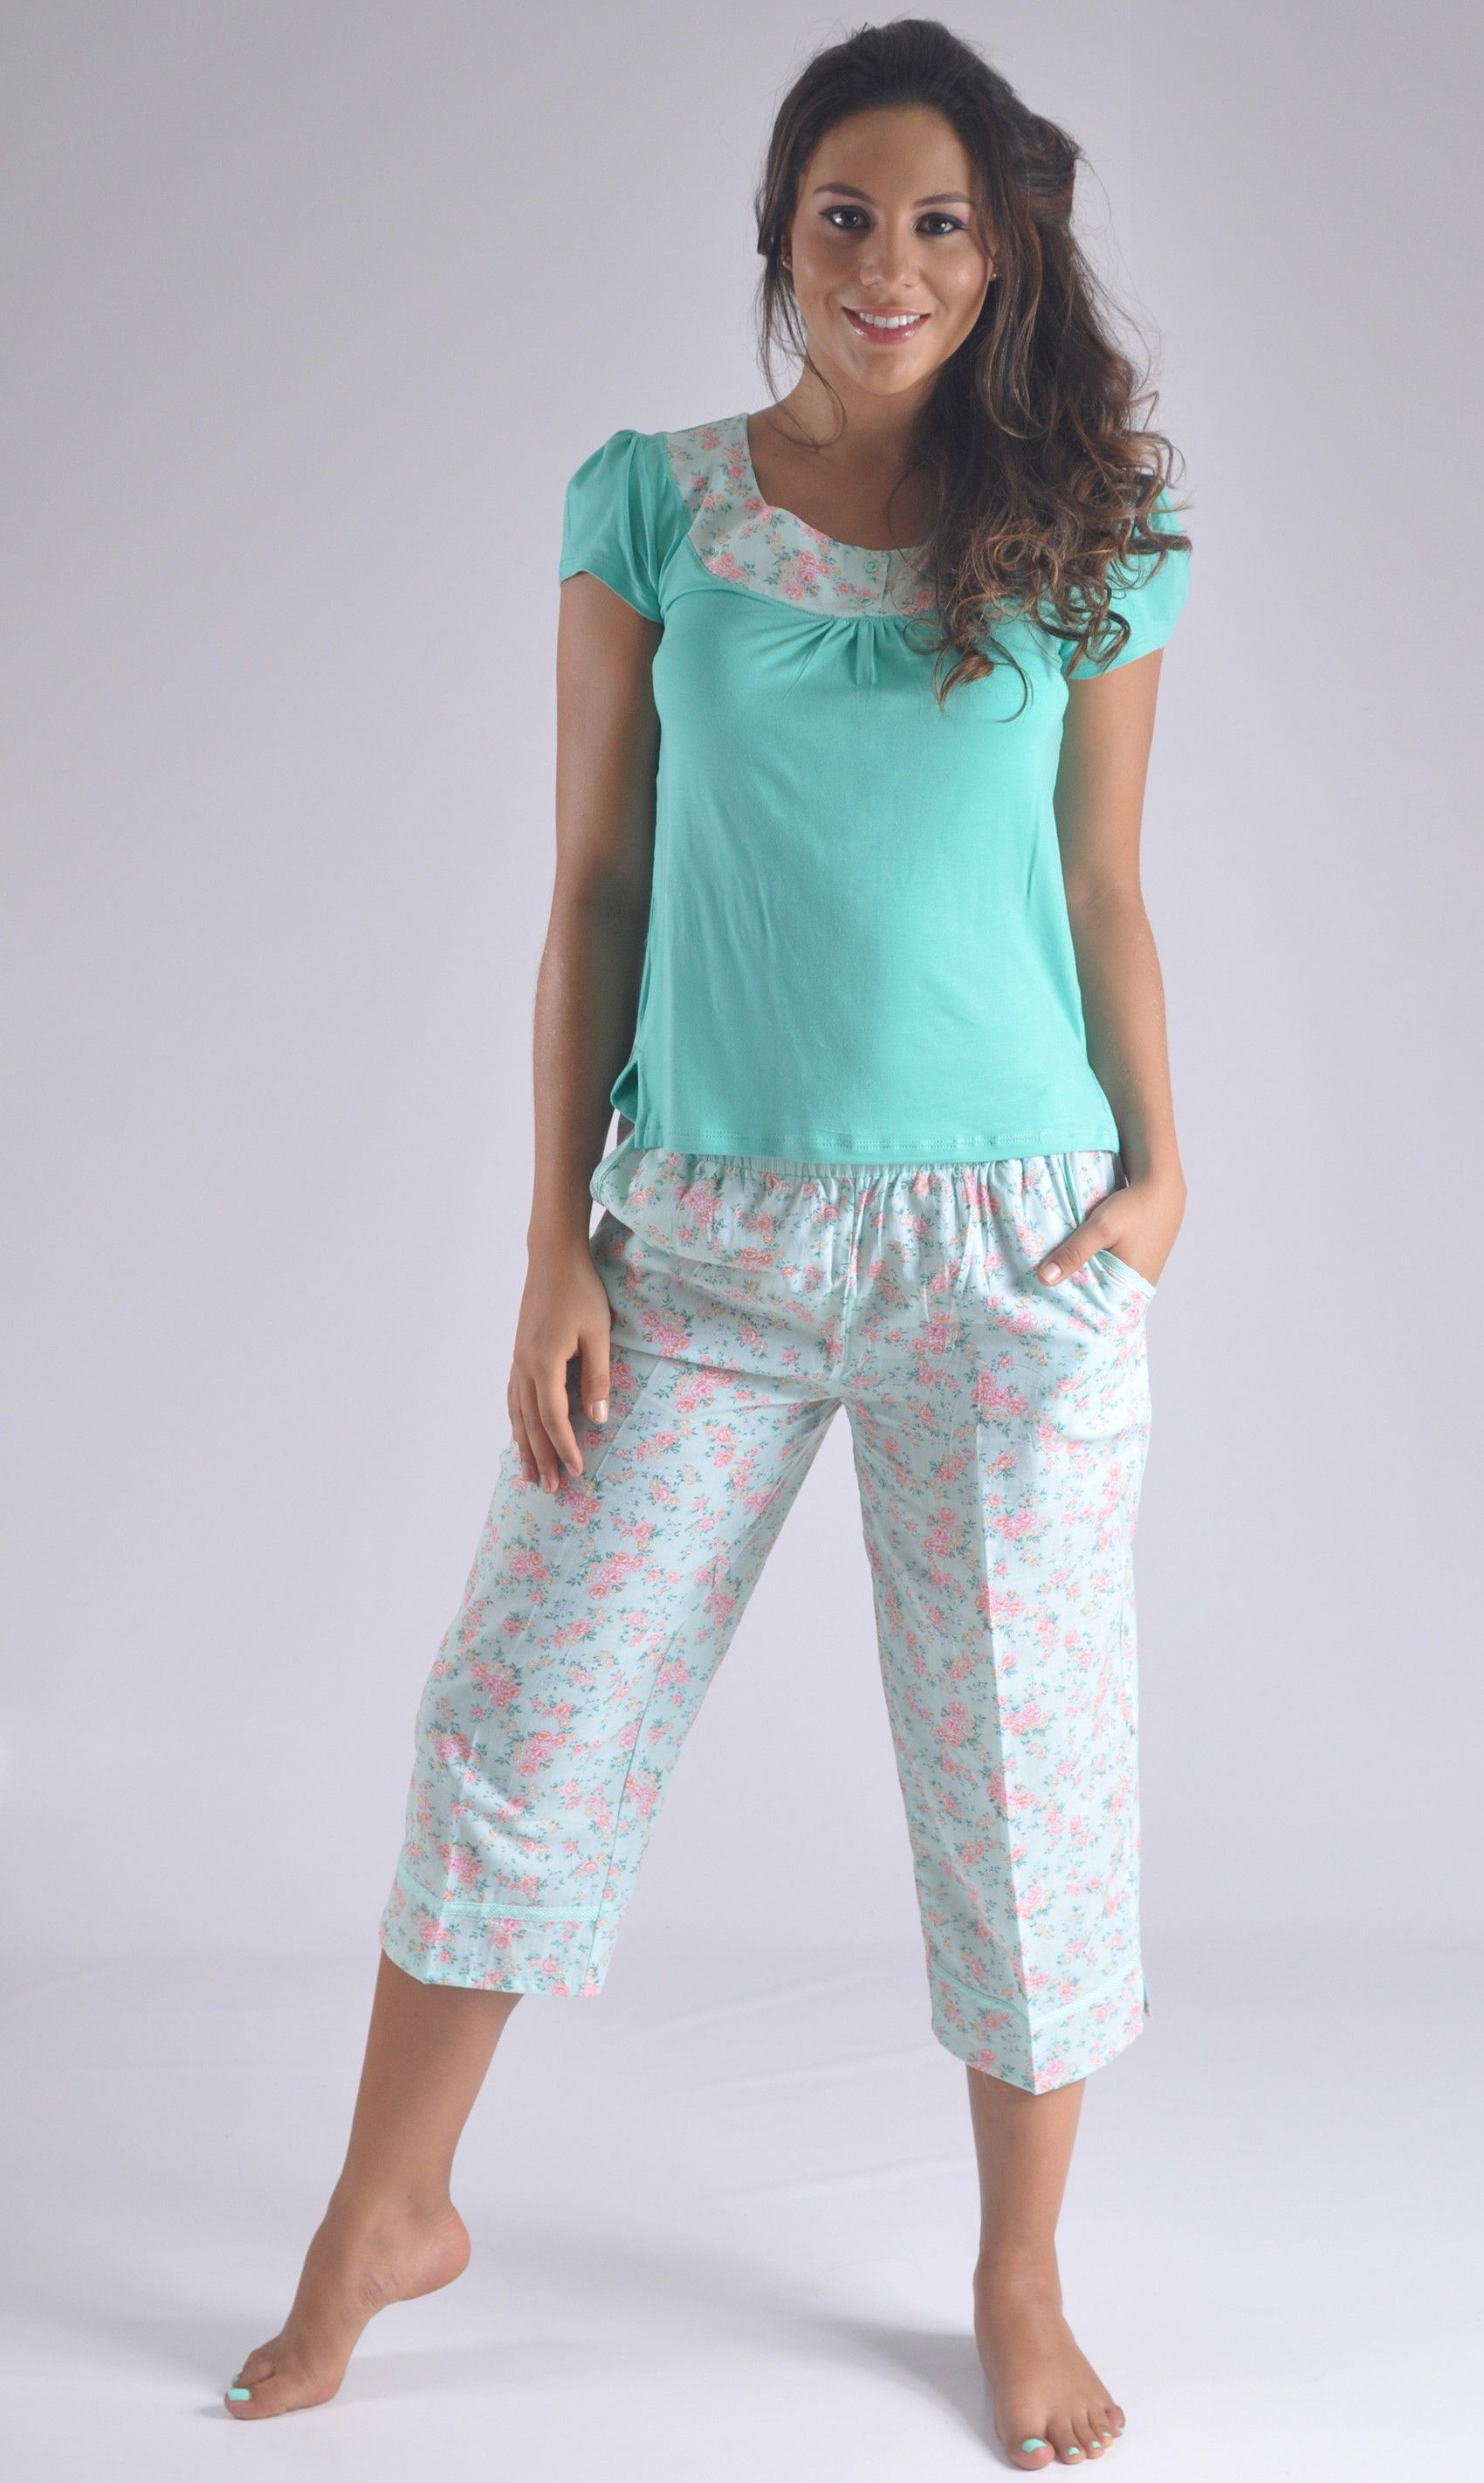 9bfab7b19 Hermosa pijama juvenil especial para la mujer joven de espiritu ...